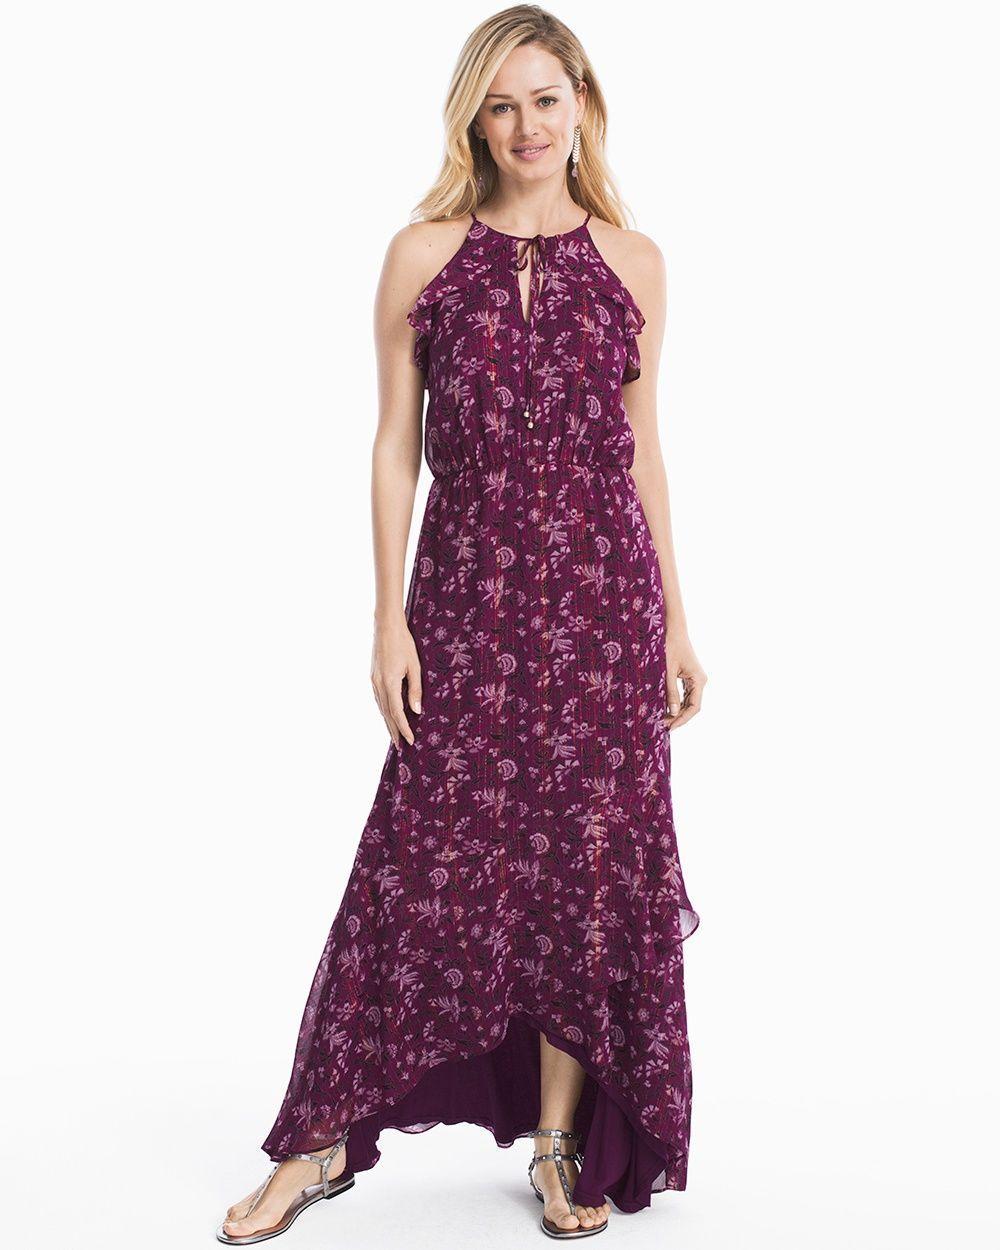 989c7fd0316e Women s Printed Hi-Lo Maxi Dress by WHBM